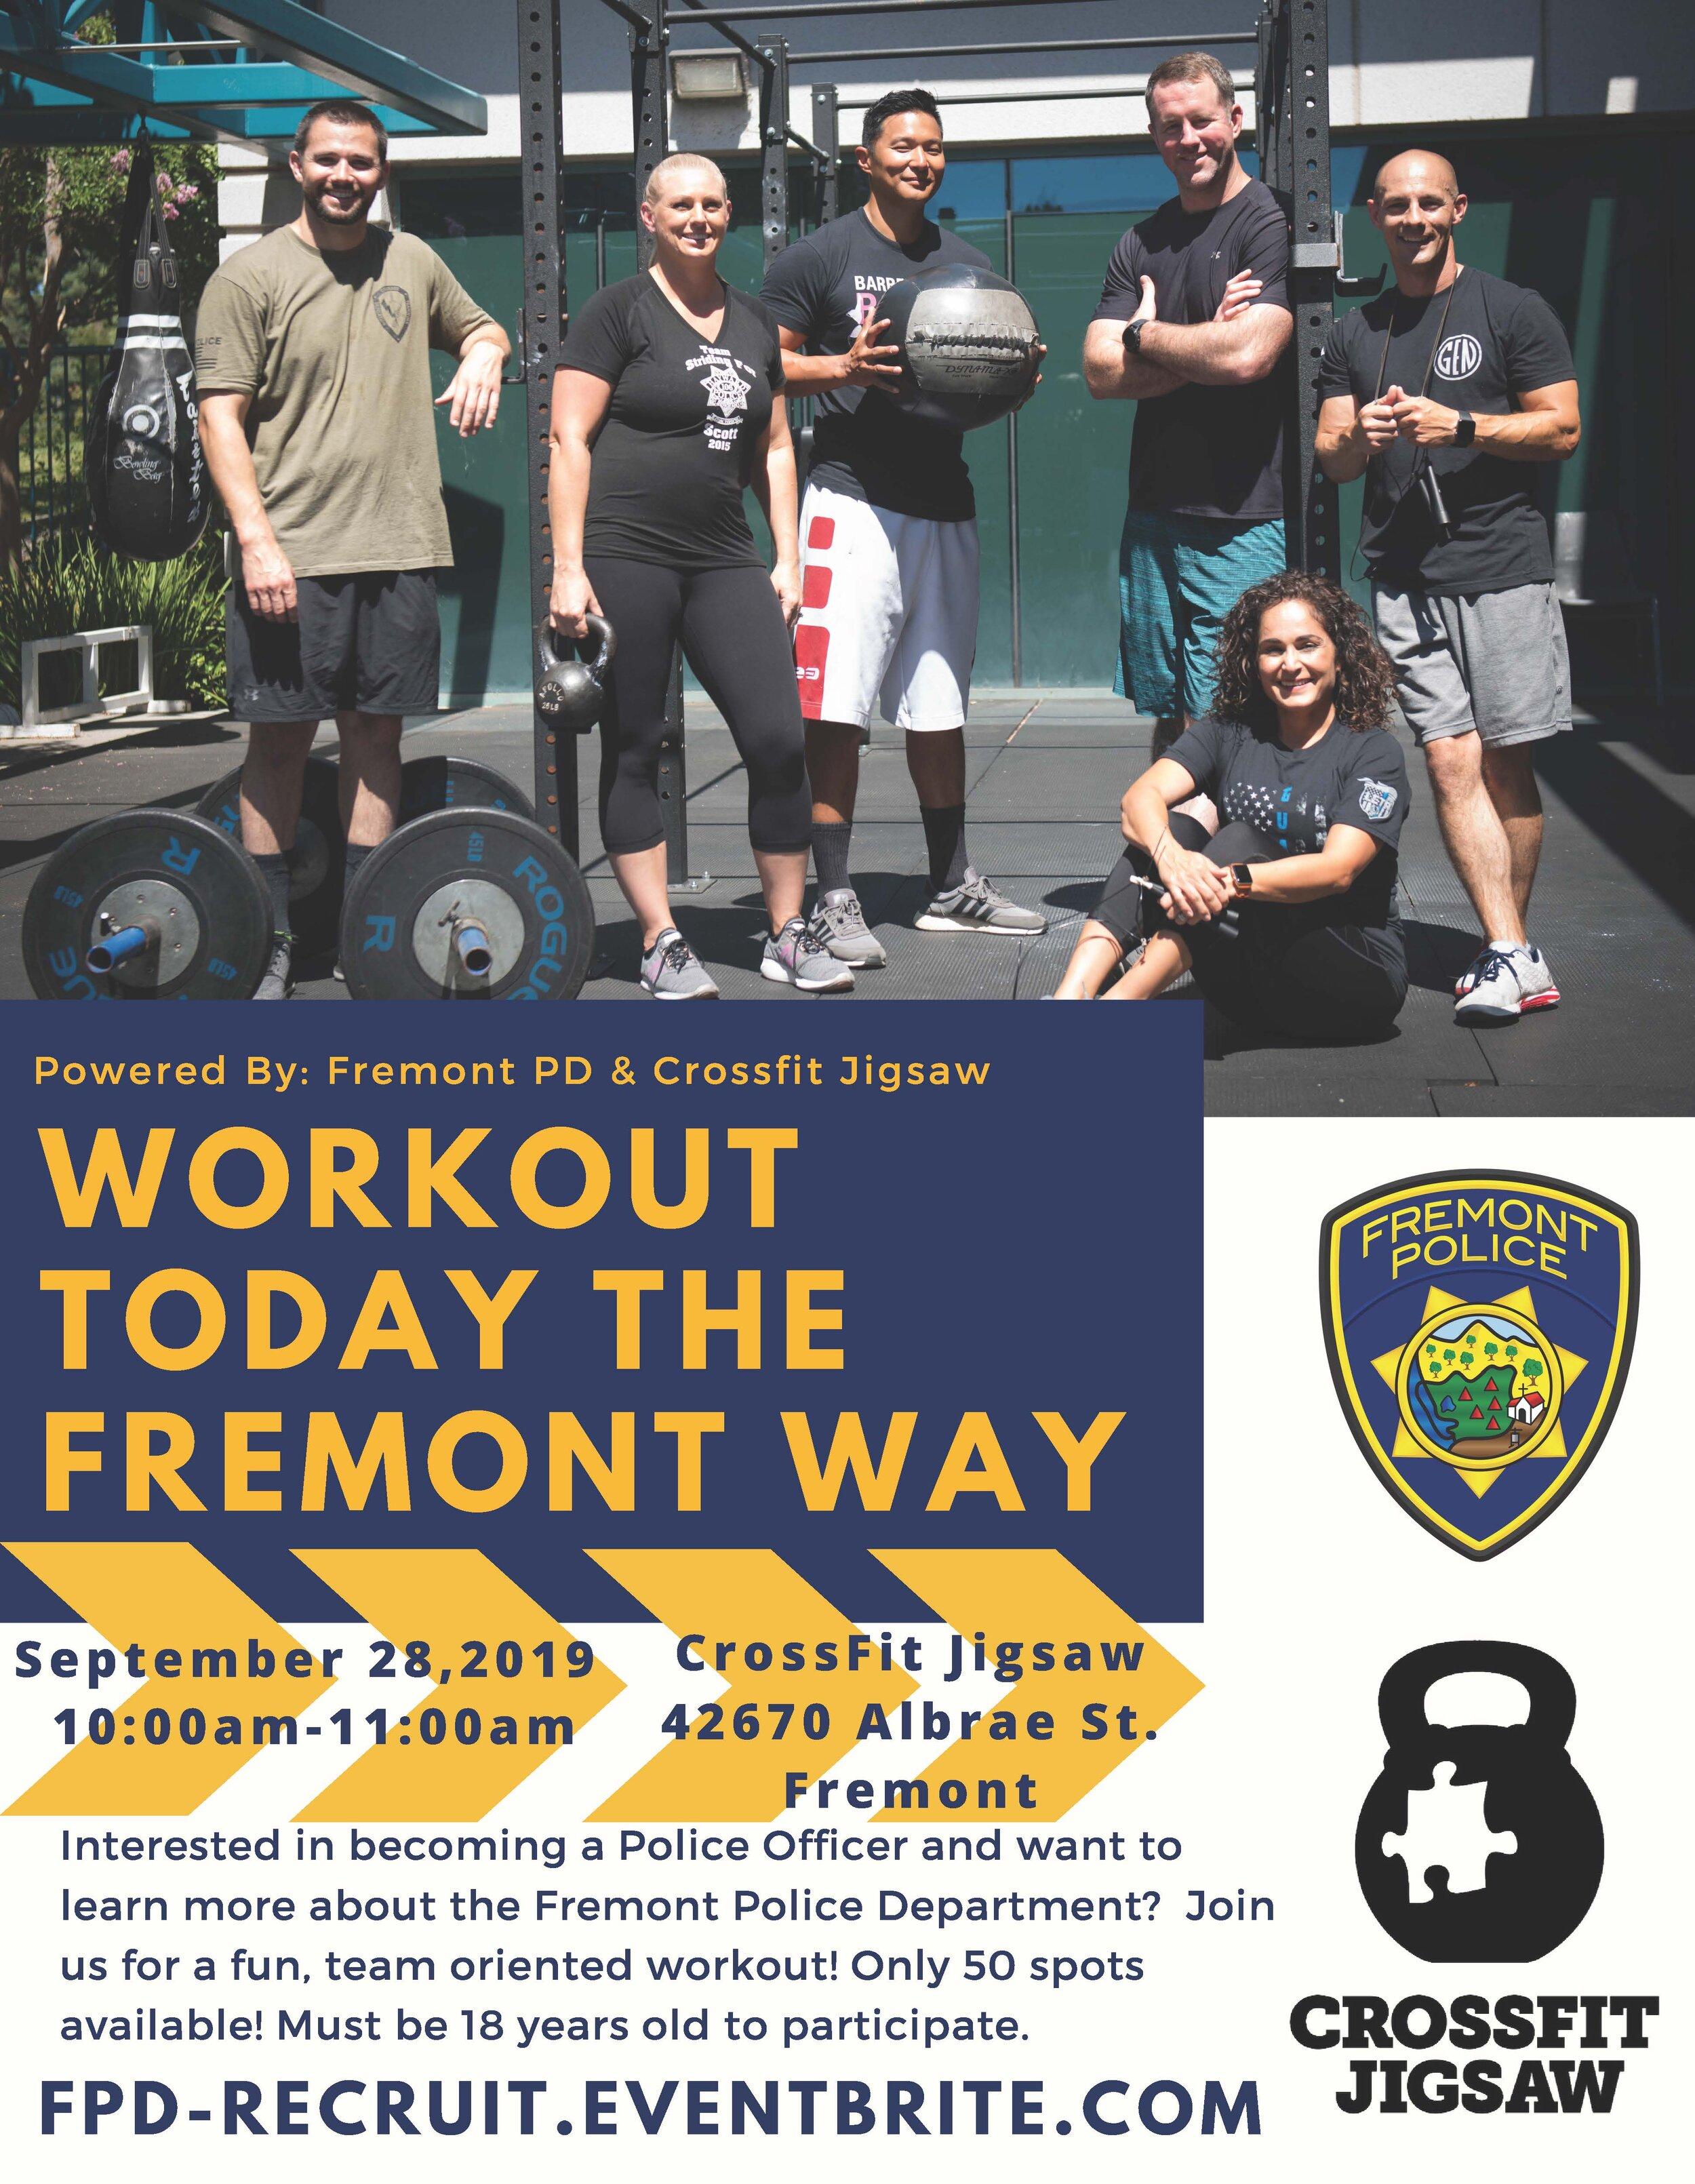 Workout Flyer.jpg